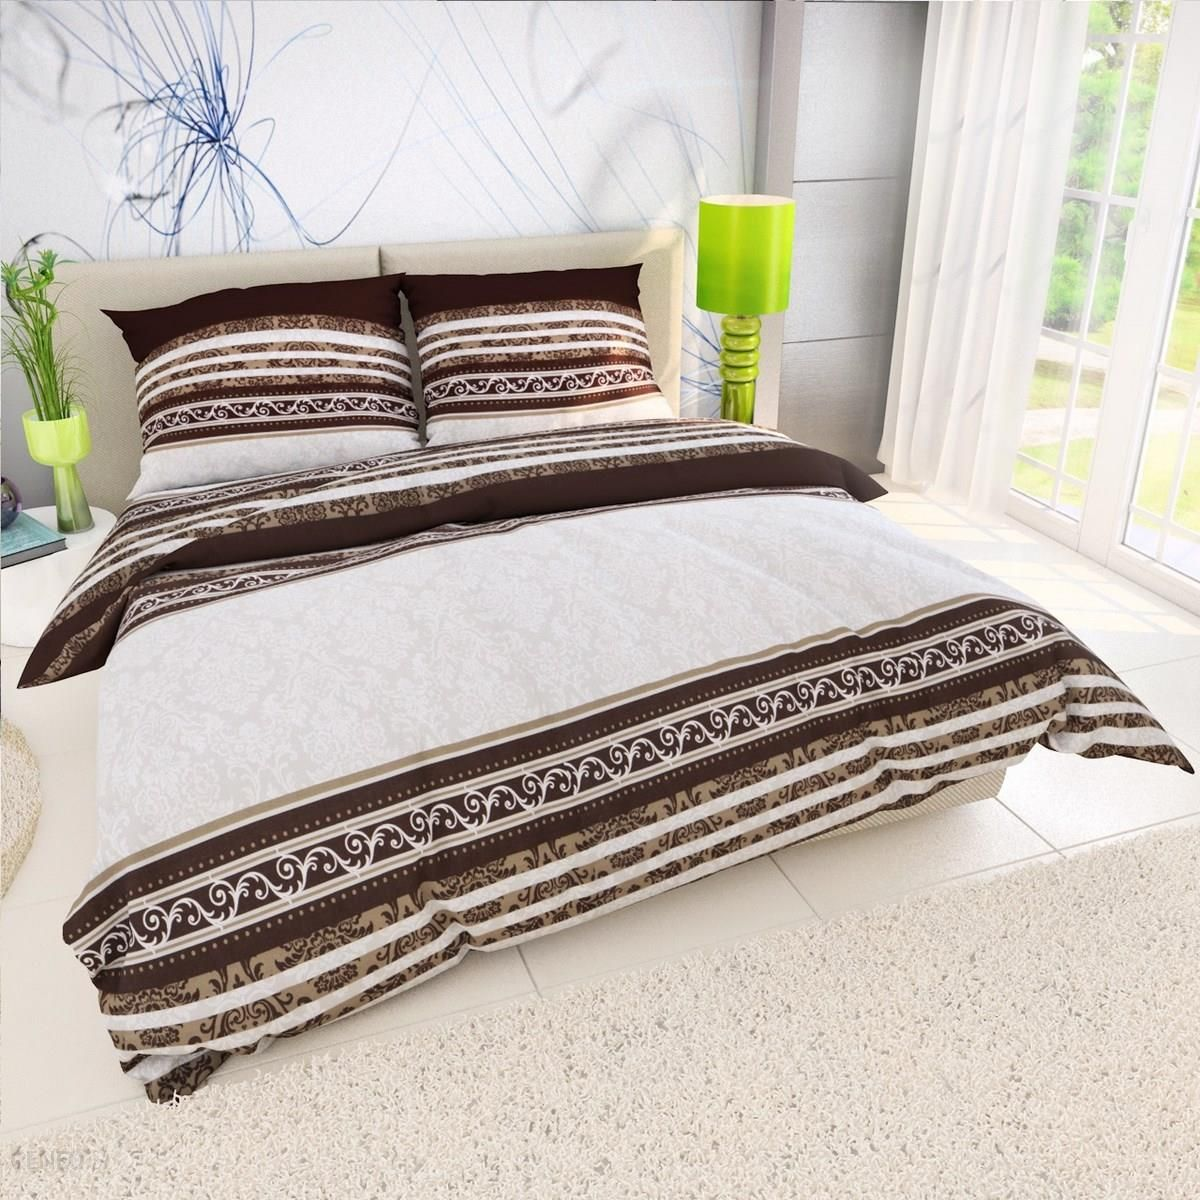 podaruj sobie maksymalny komfort i relaks z delikatn bawe n delux i po ciel z pi knym motywem. Black Bedroom Furniture Sets. Home Design Ideas